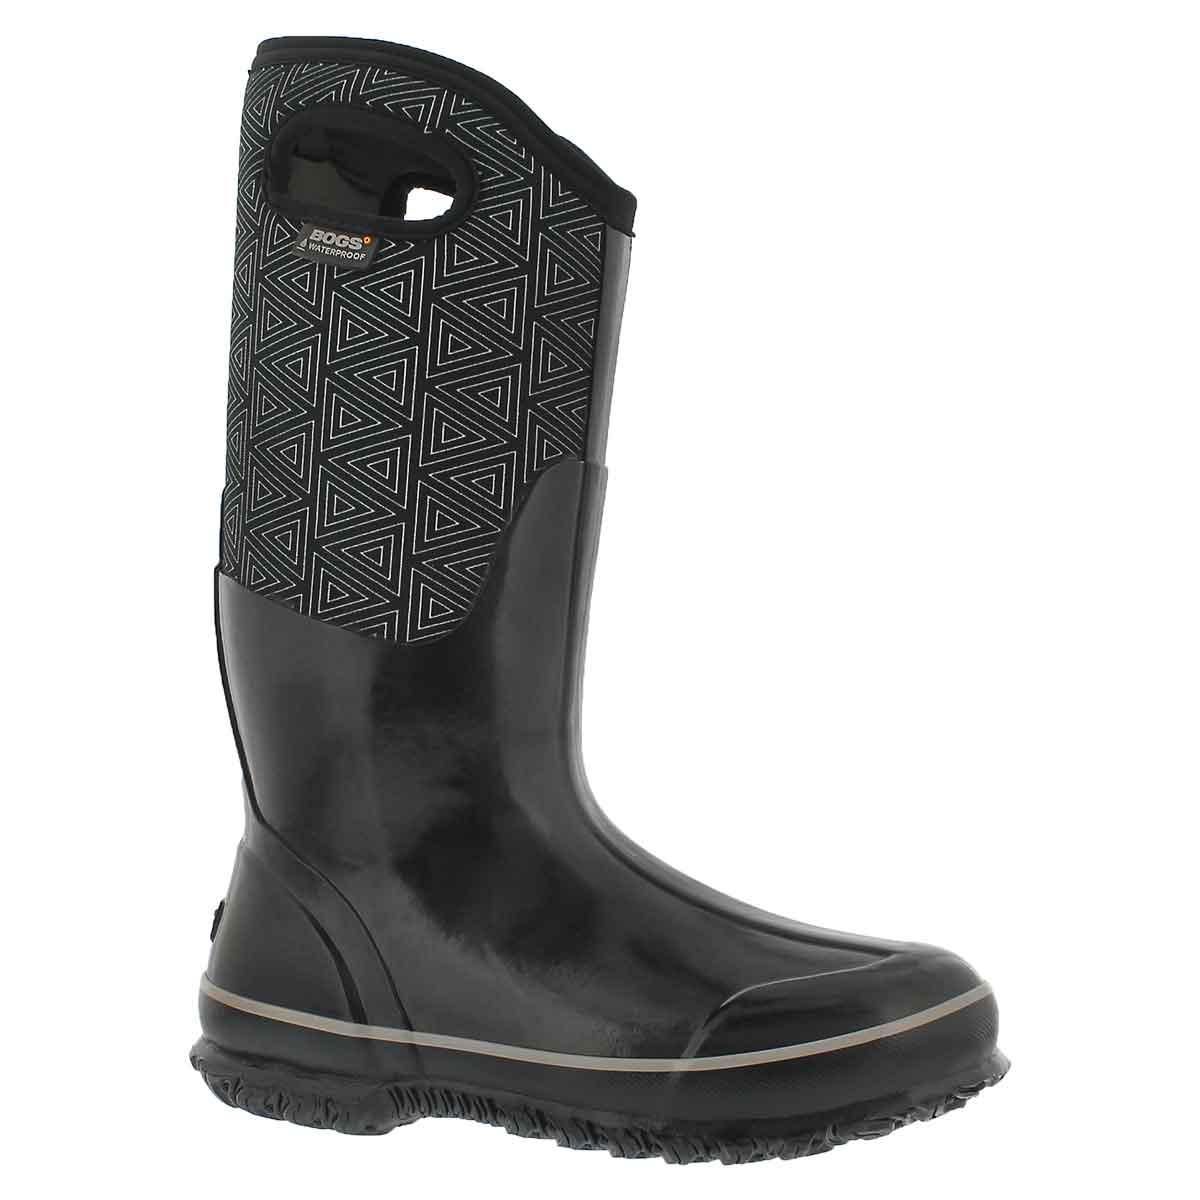 Women's CLASSIC TRIANGLES black multi wtpf boots